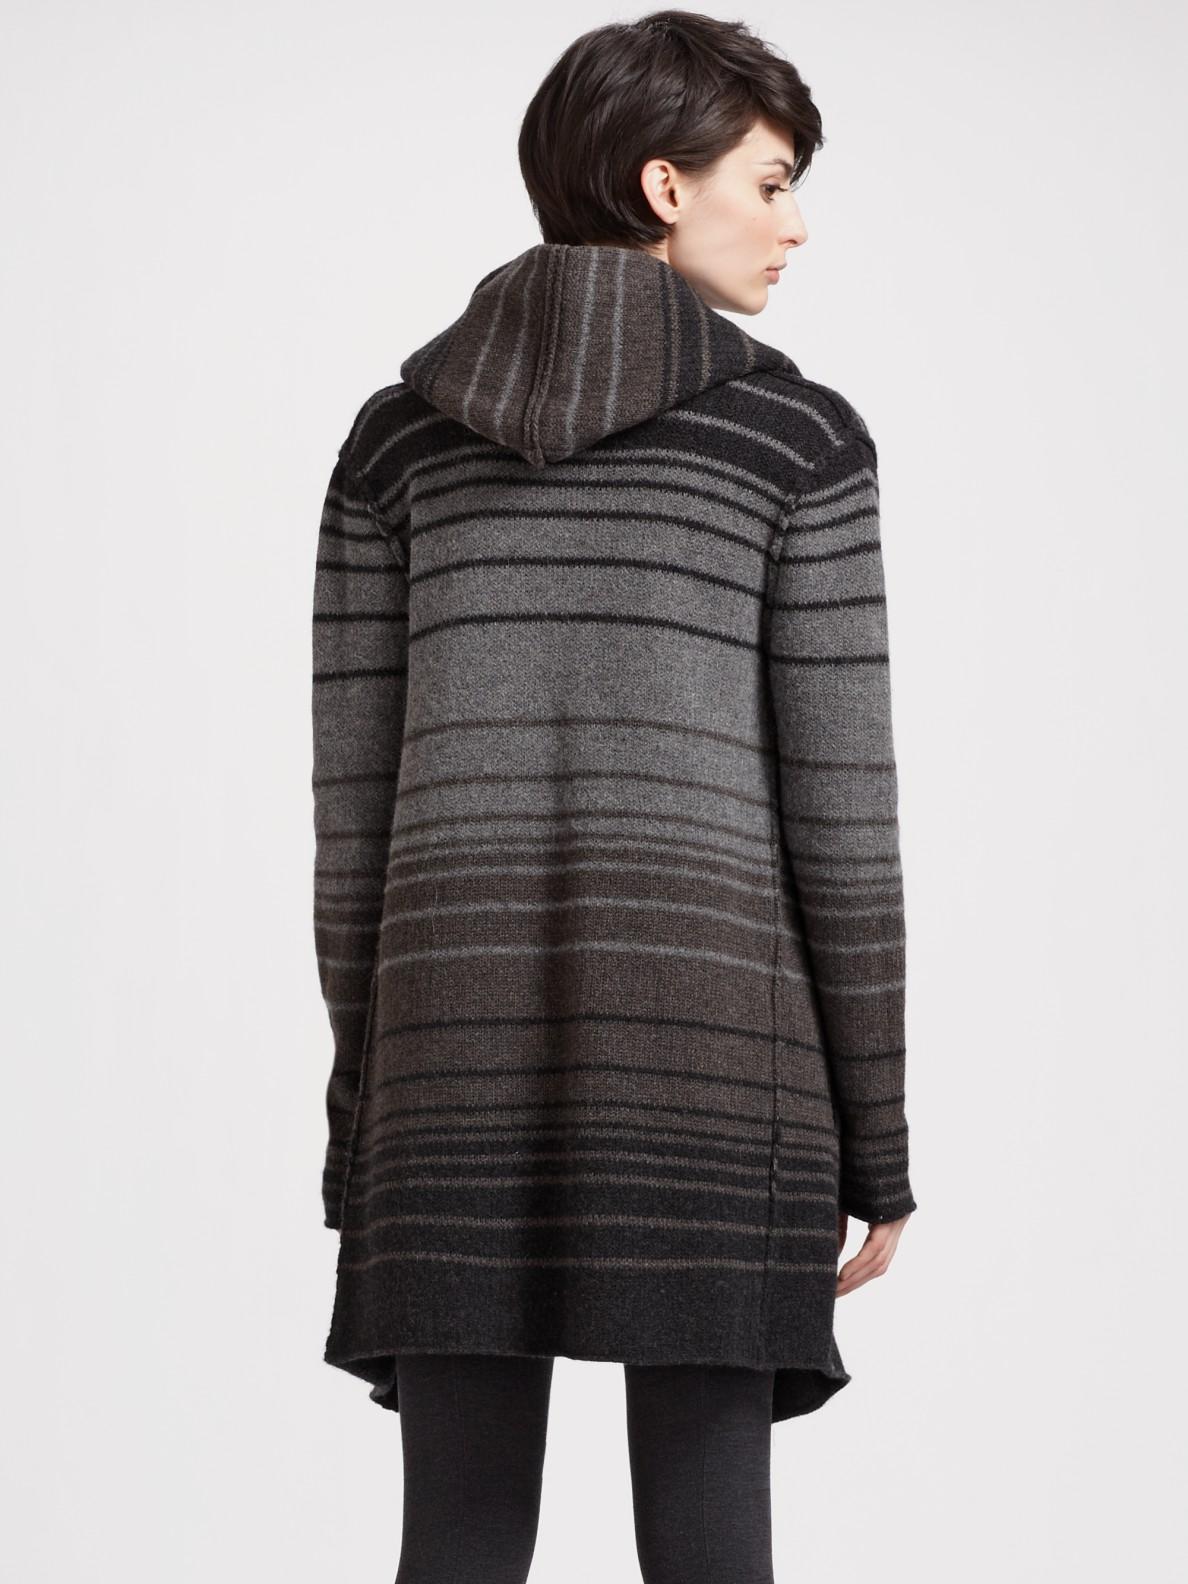 Vince Sophie Striped Sweater Coat In Black Lyst